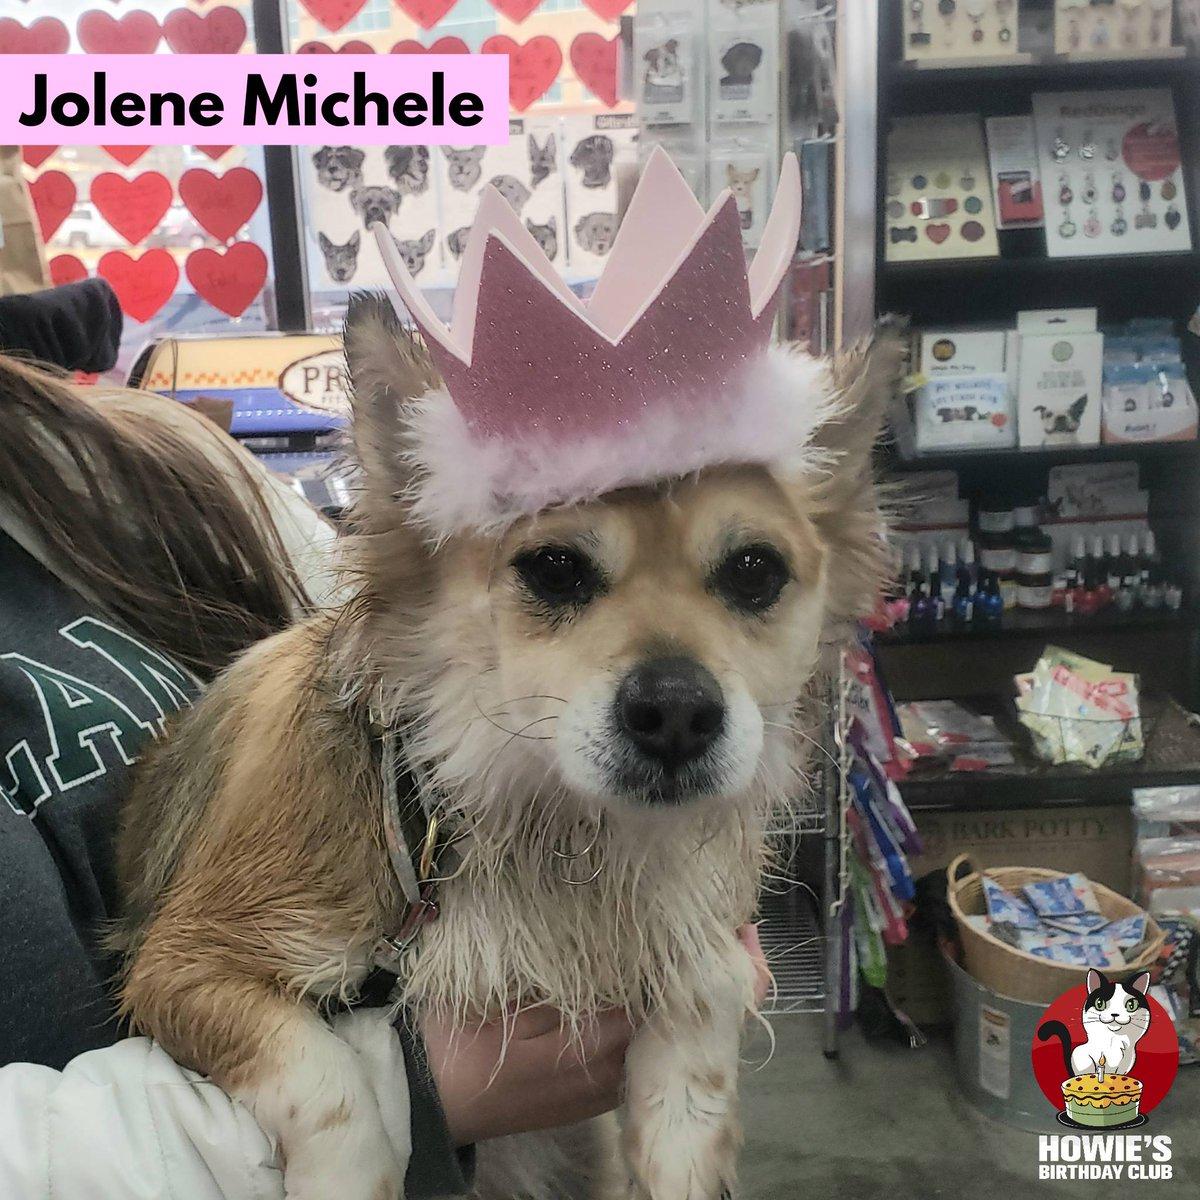 Happy Birthday Jolene Michele! 🎂 #buschpet #jolene #jolenemichele #happybirthday #howiesbirthdayclub #dogsincrowns #queen #birthdaygirl #birthdaydog #partyon #dog #doglife #happyday #dogsofig #dogsofinstagram #instadog #dogstagram #dogsofmissouri #dogsofsemo #capegirardeau